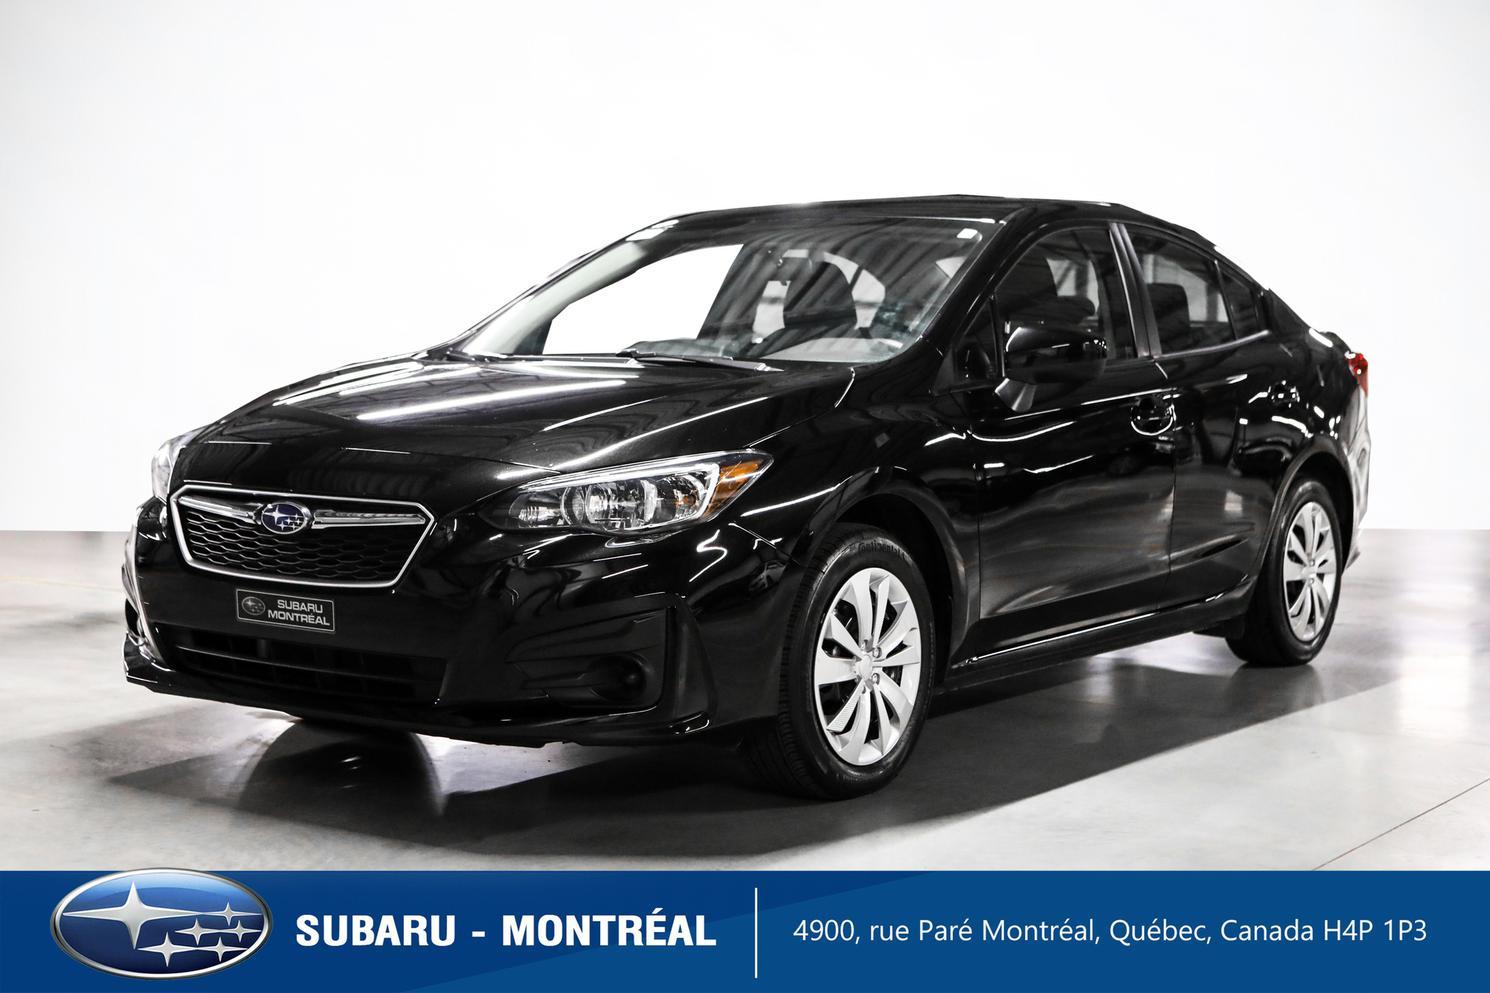 2019 Subaru Impreza Convenience